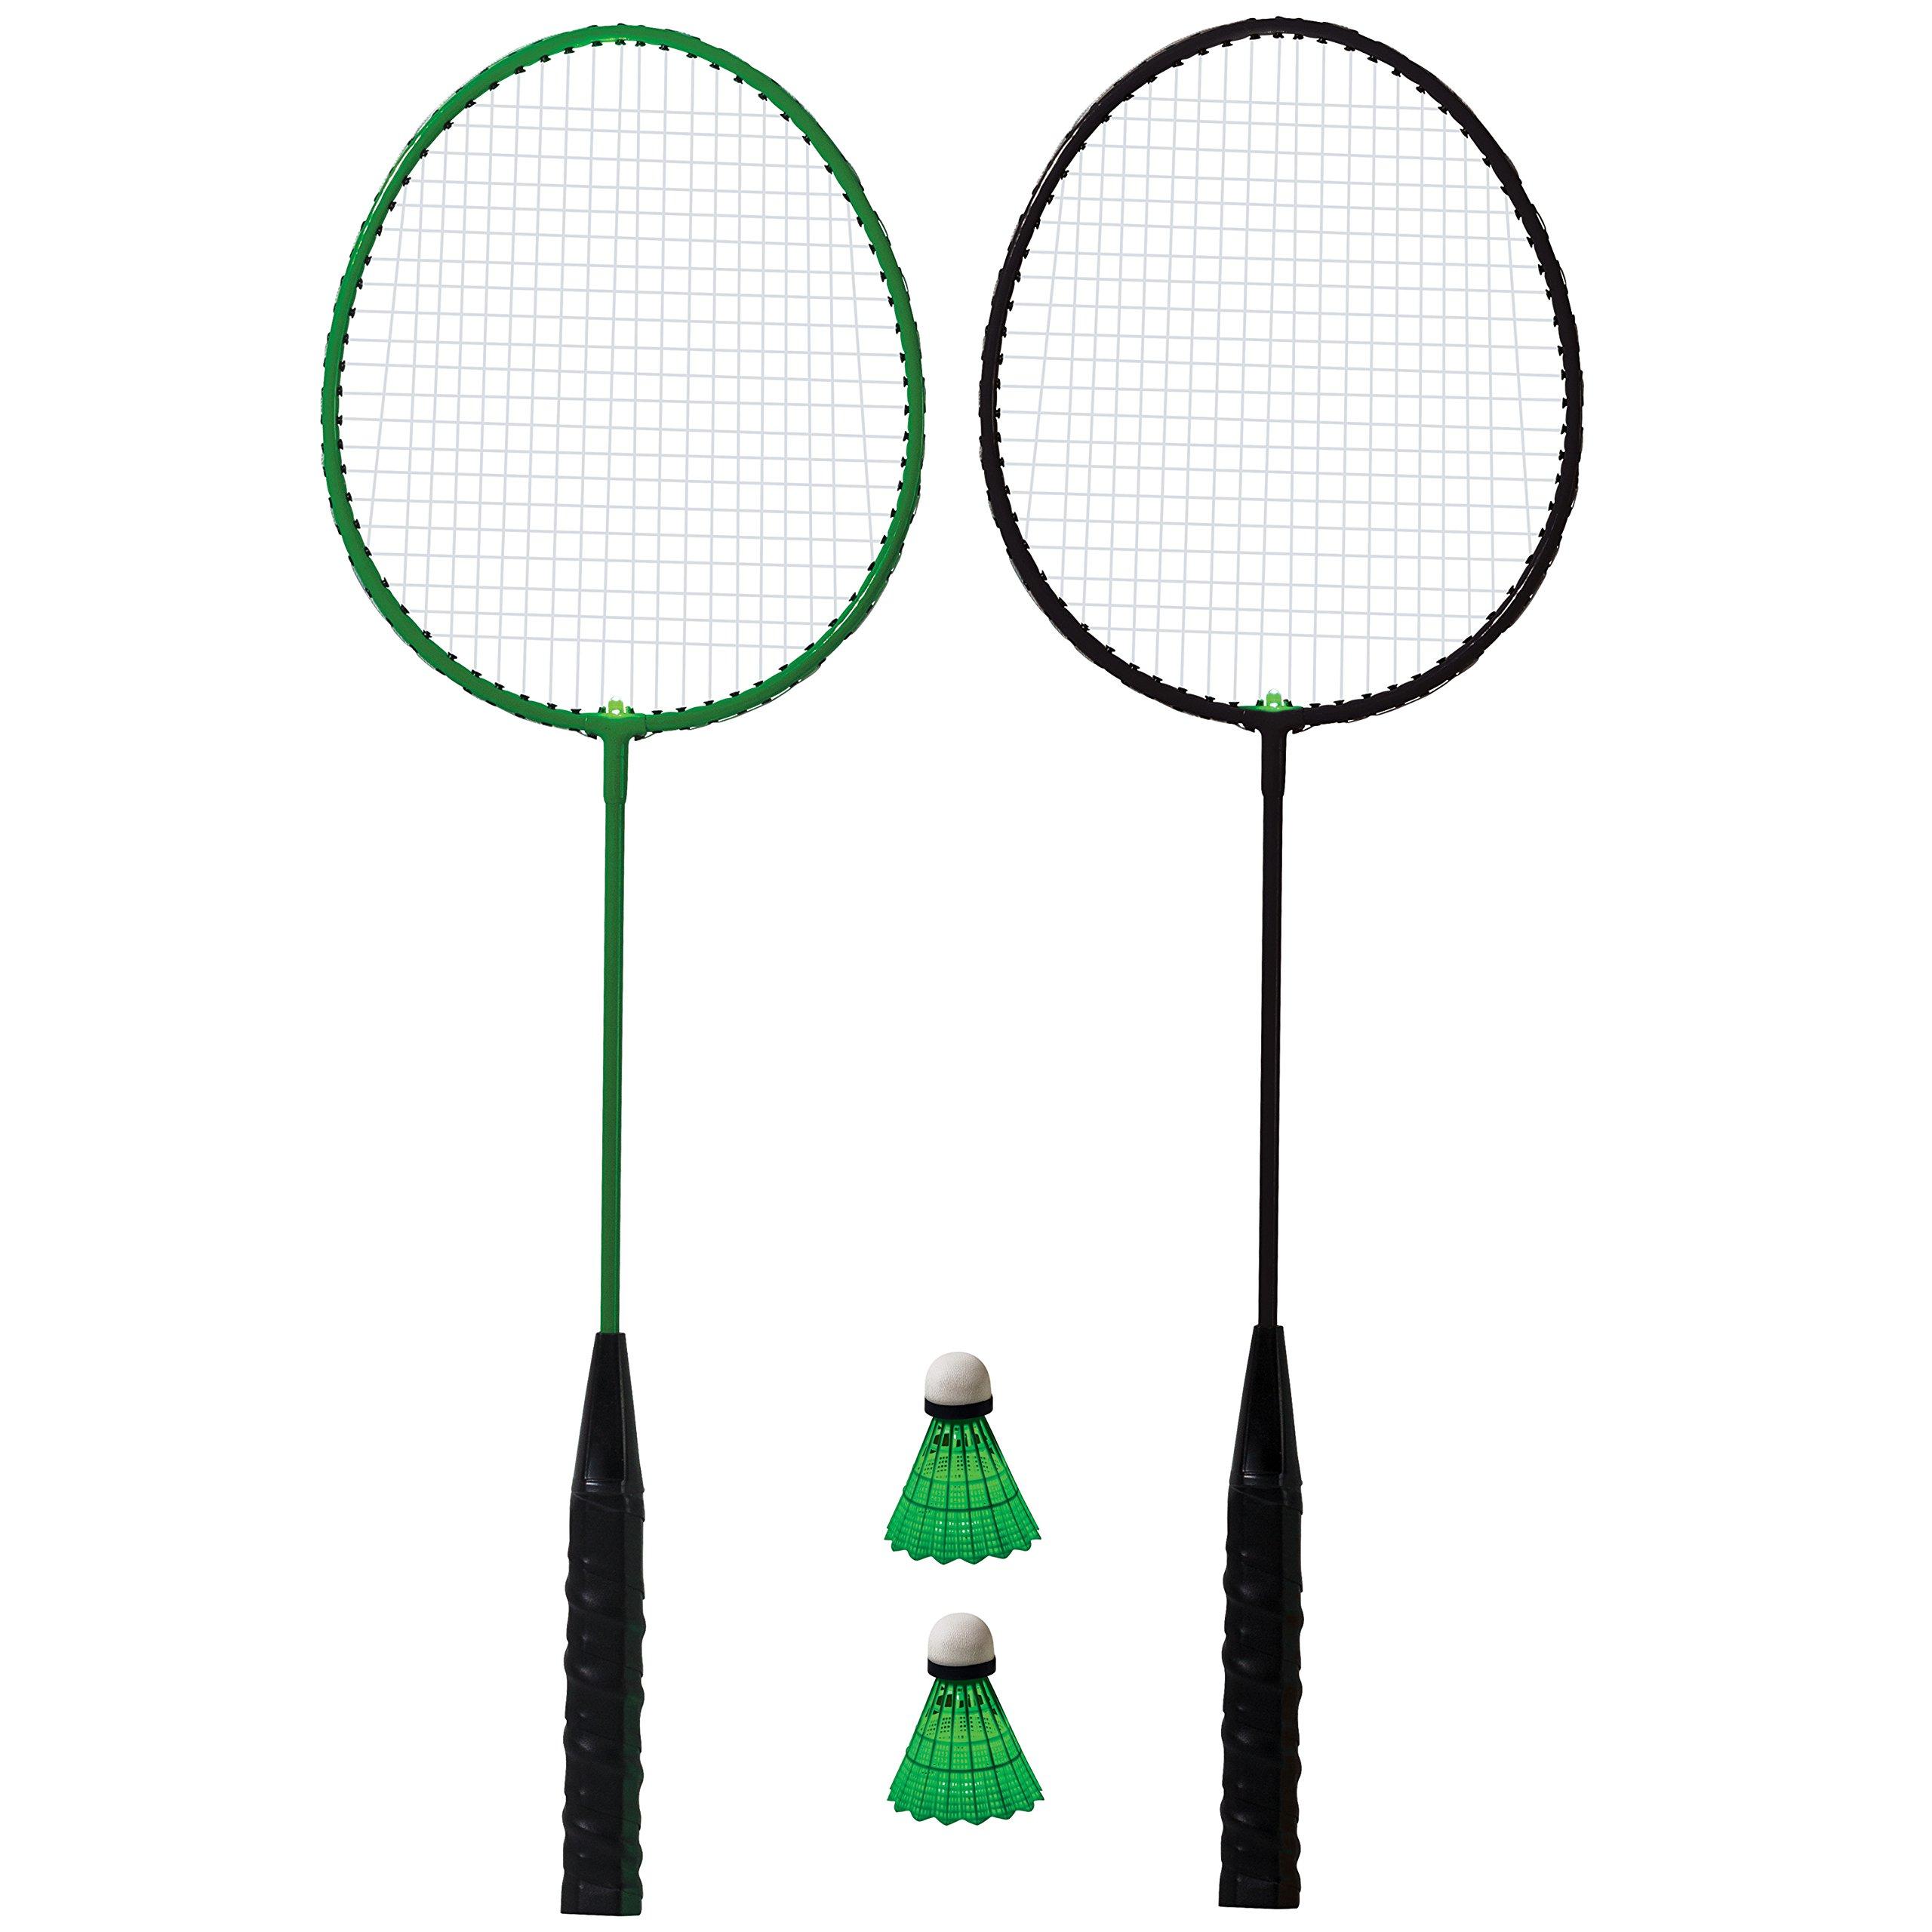 Franklin Sports Industry 52622 Badminton Racket Advanced Quantity 6